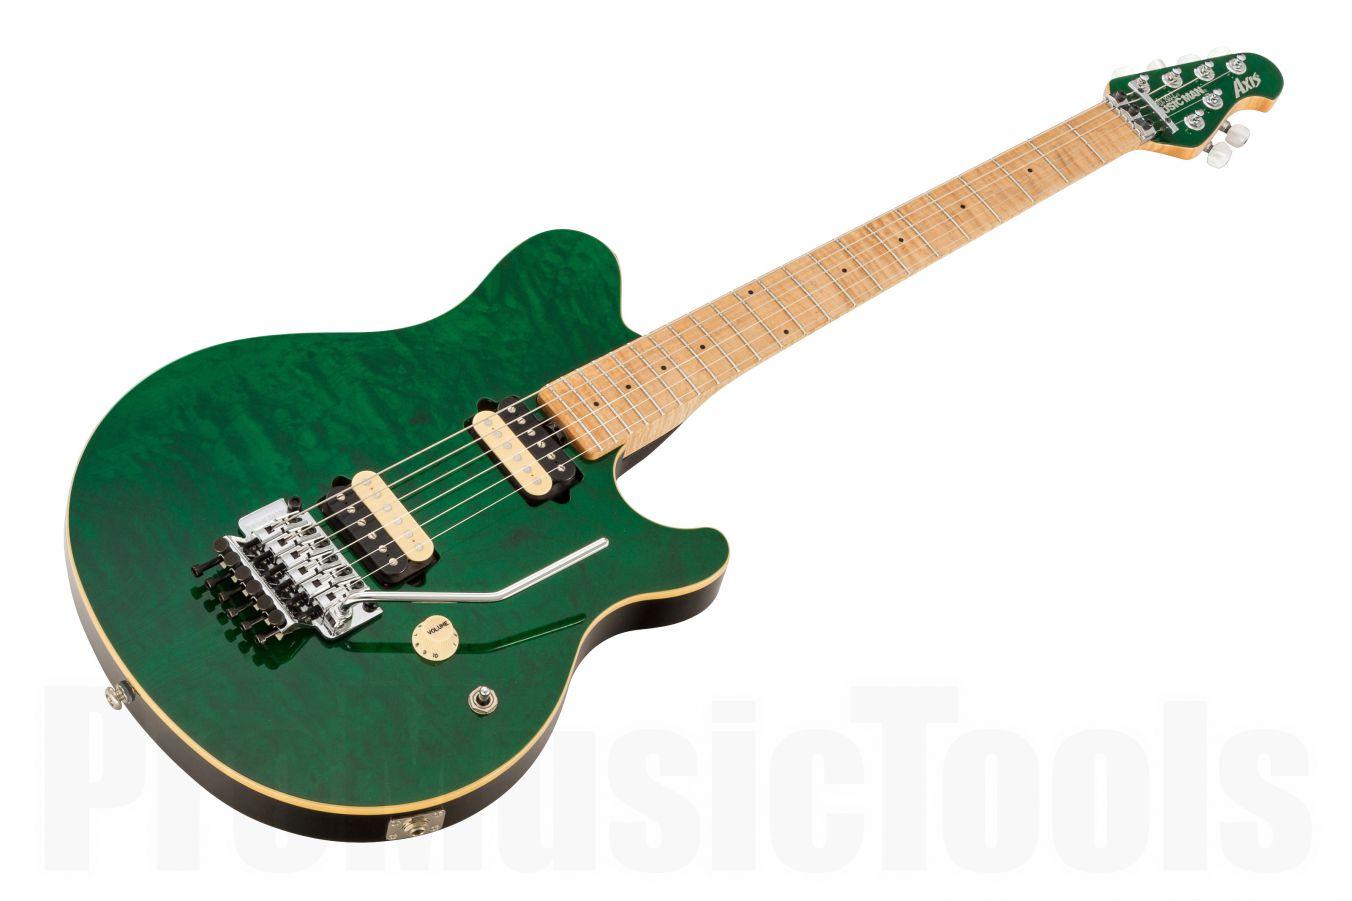 Music Man USA Axis TGN - Translucent Green MH QT